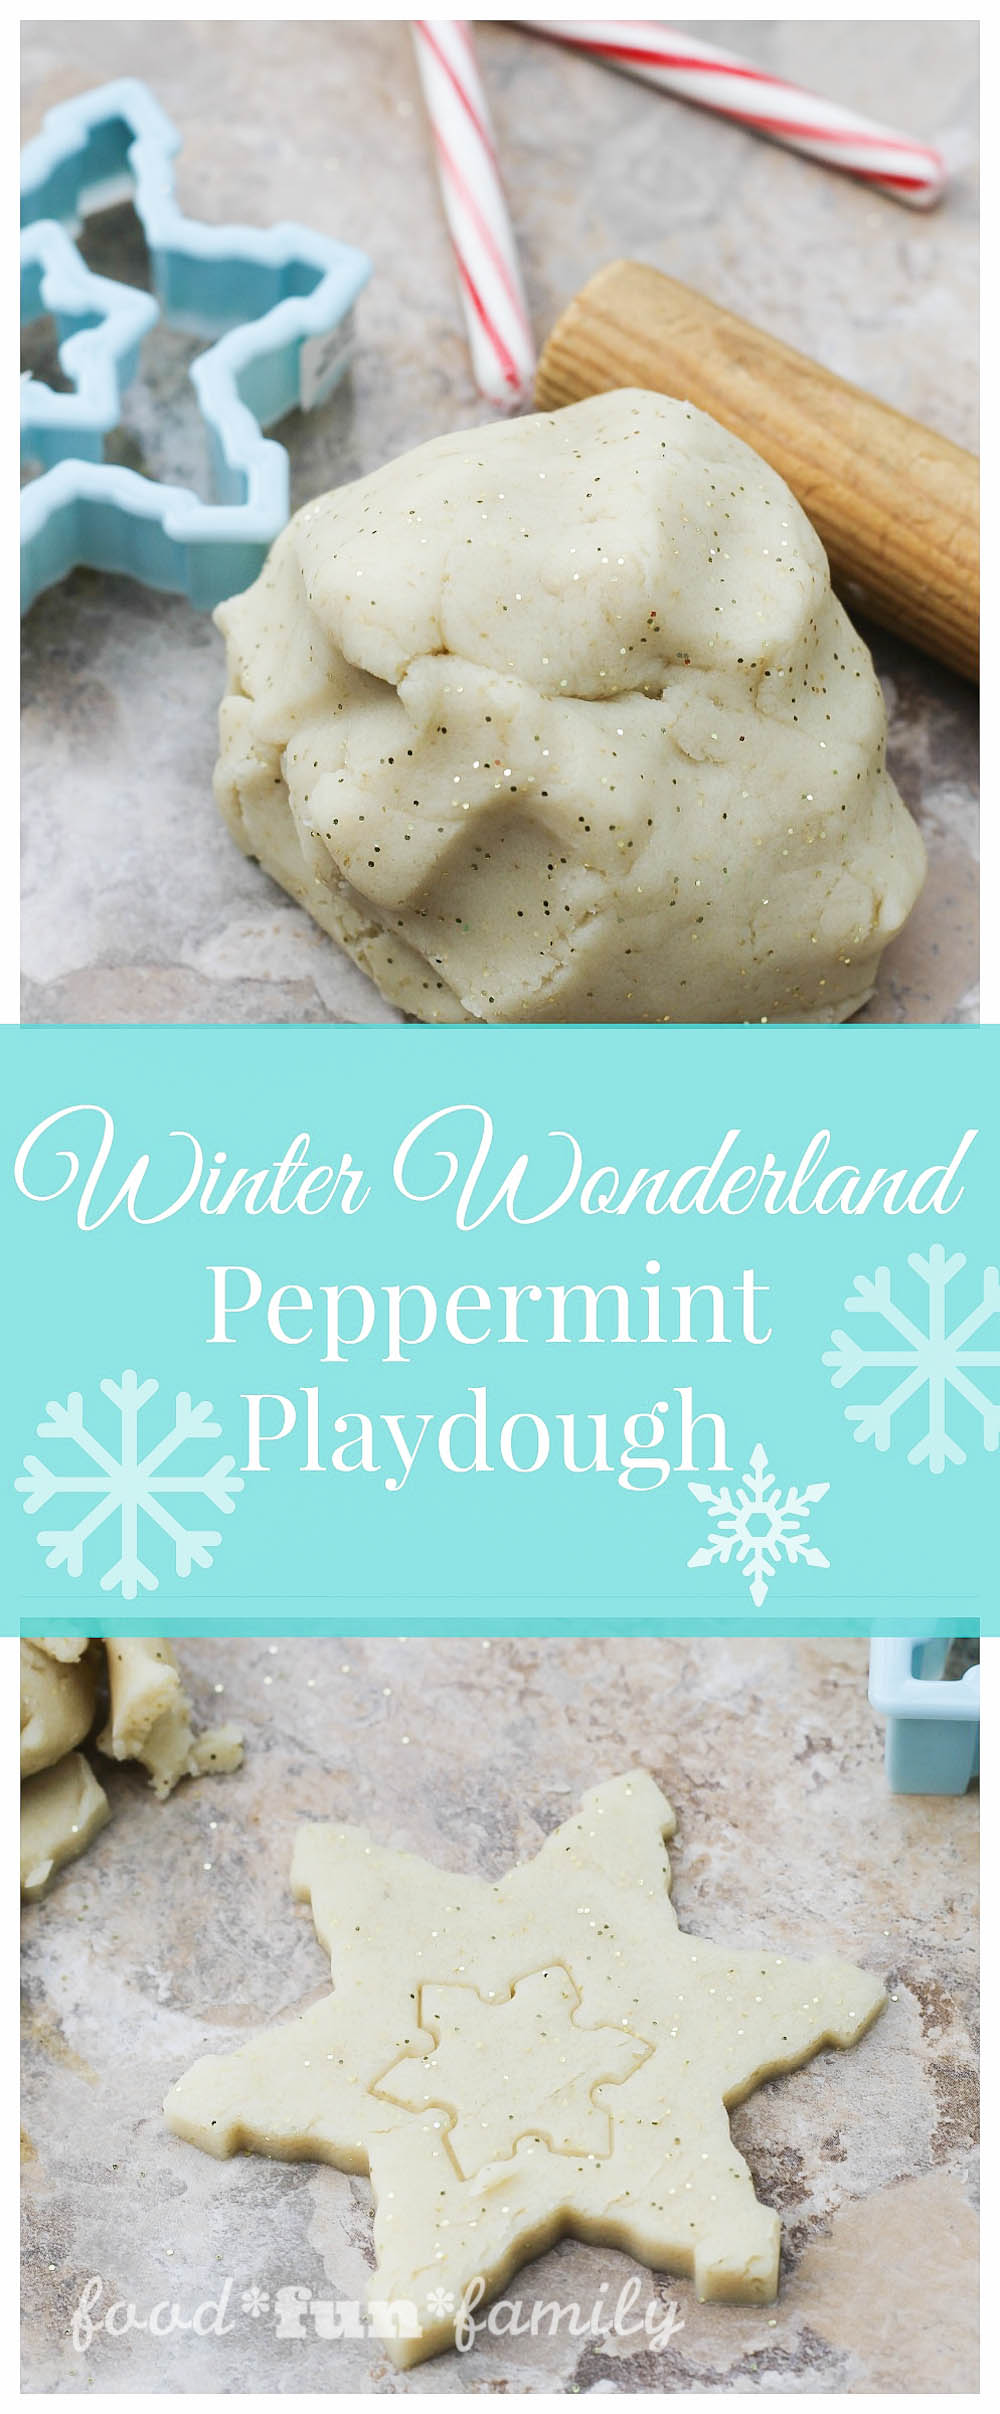 Winter Wonderland Peppermint playdough from Food Fun Family